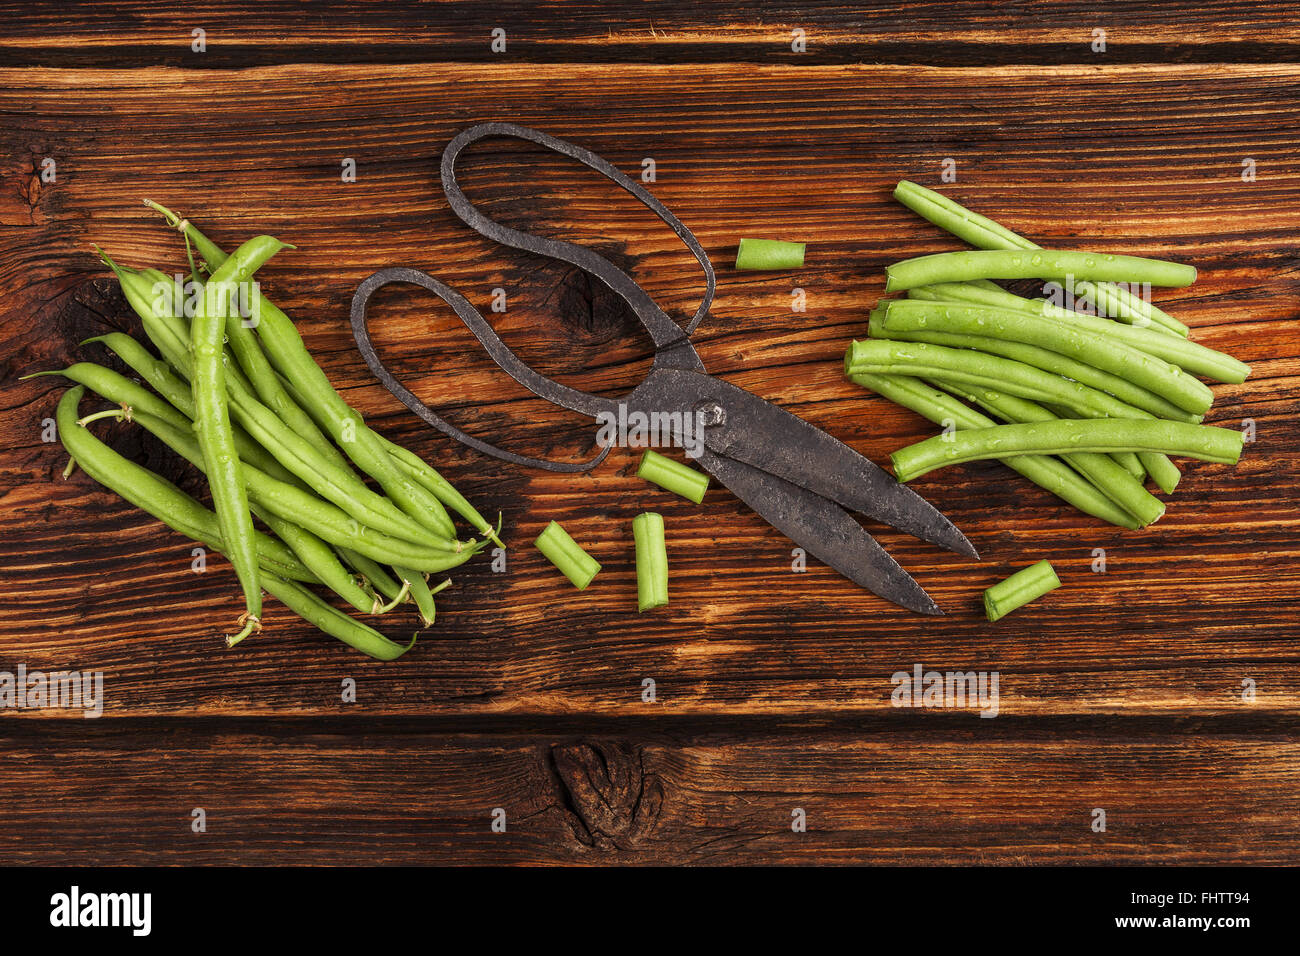 Green beans. - Stock Image